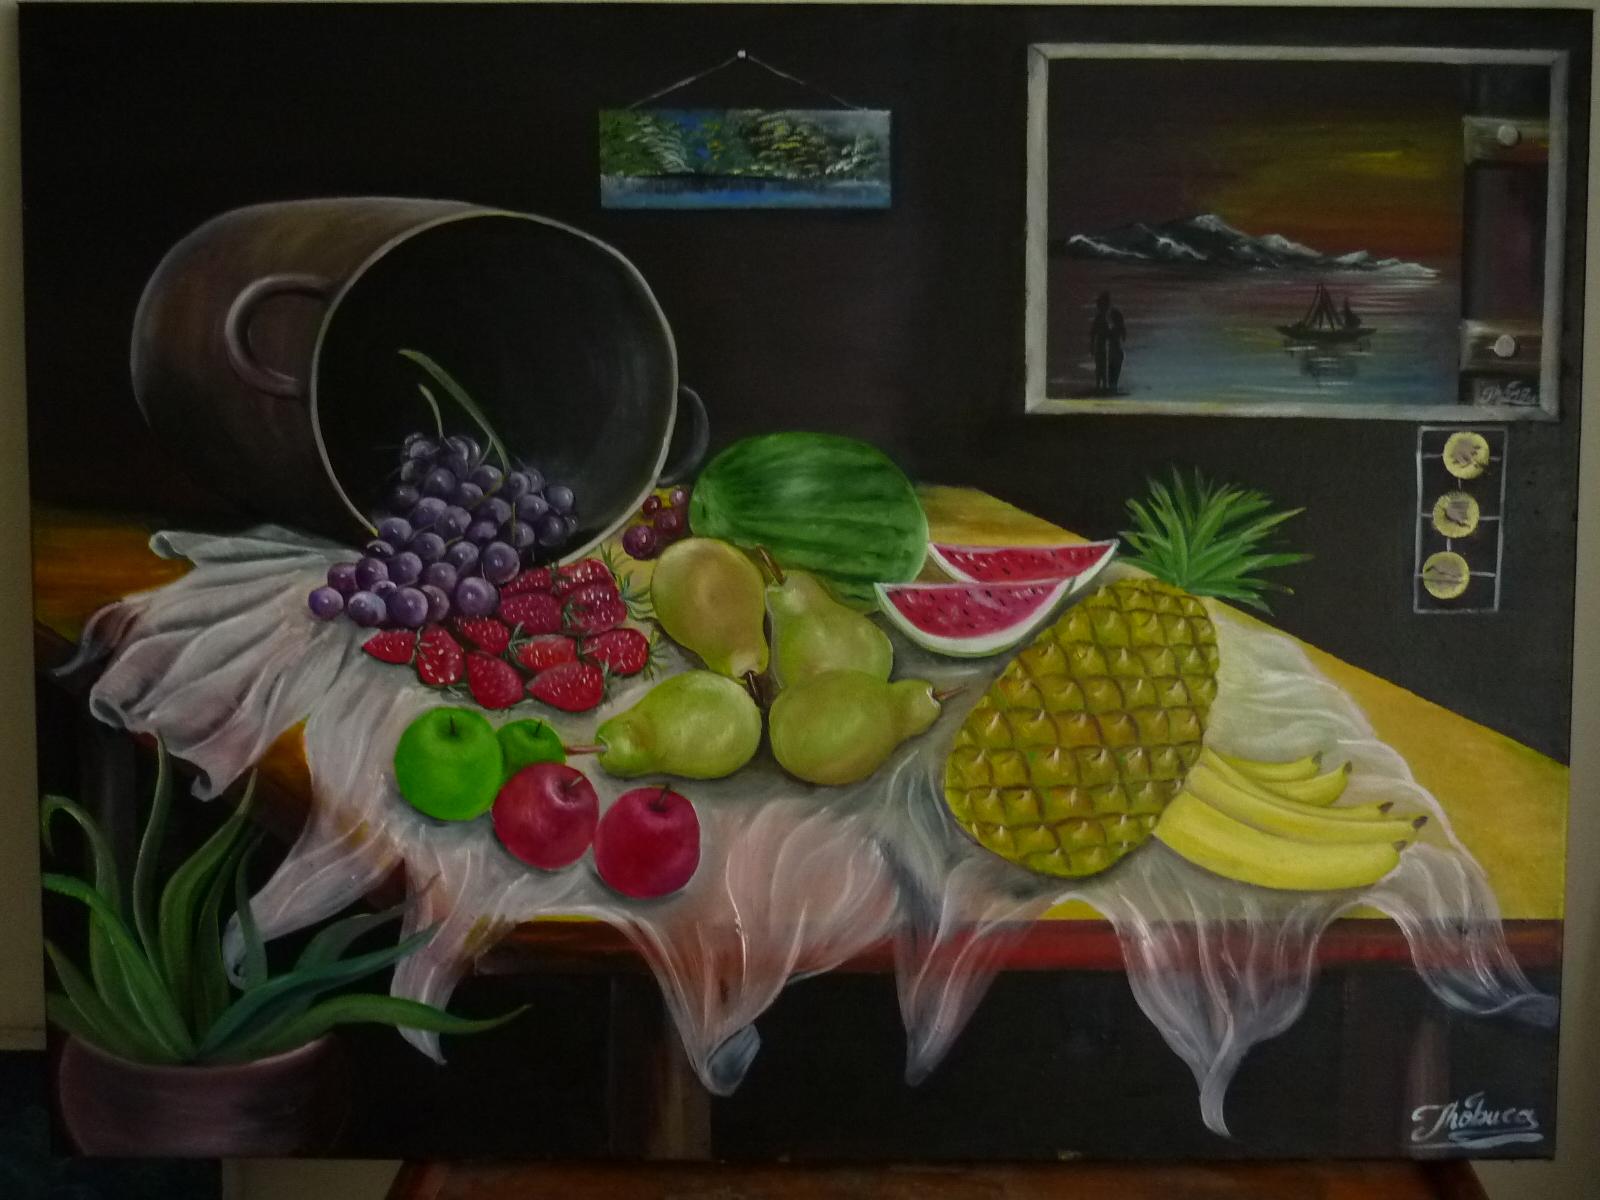 Pinturas de fruteros al oleo - Imagui